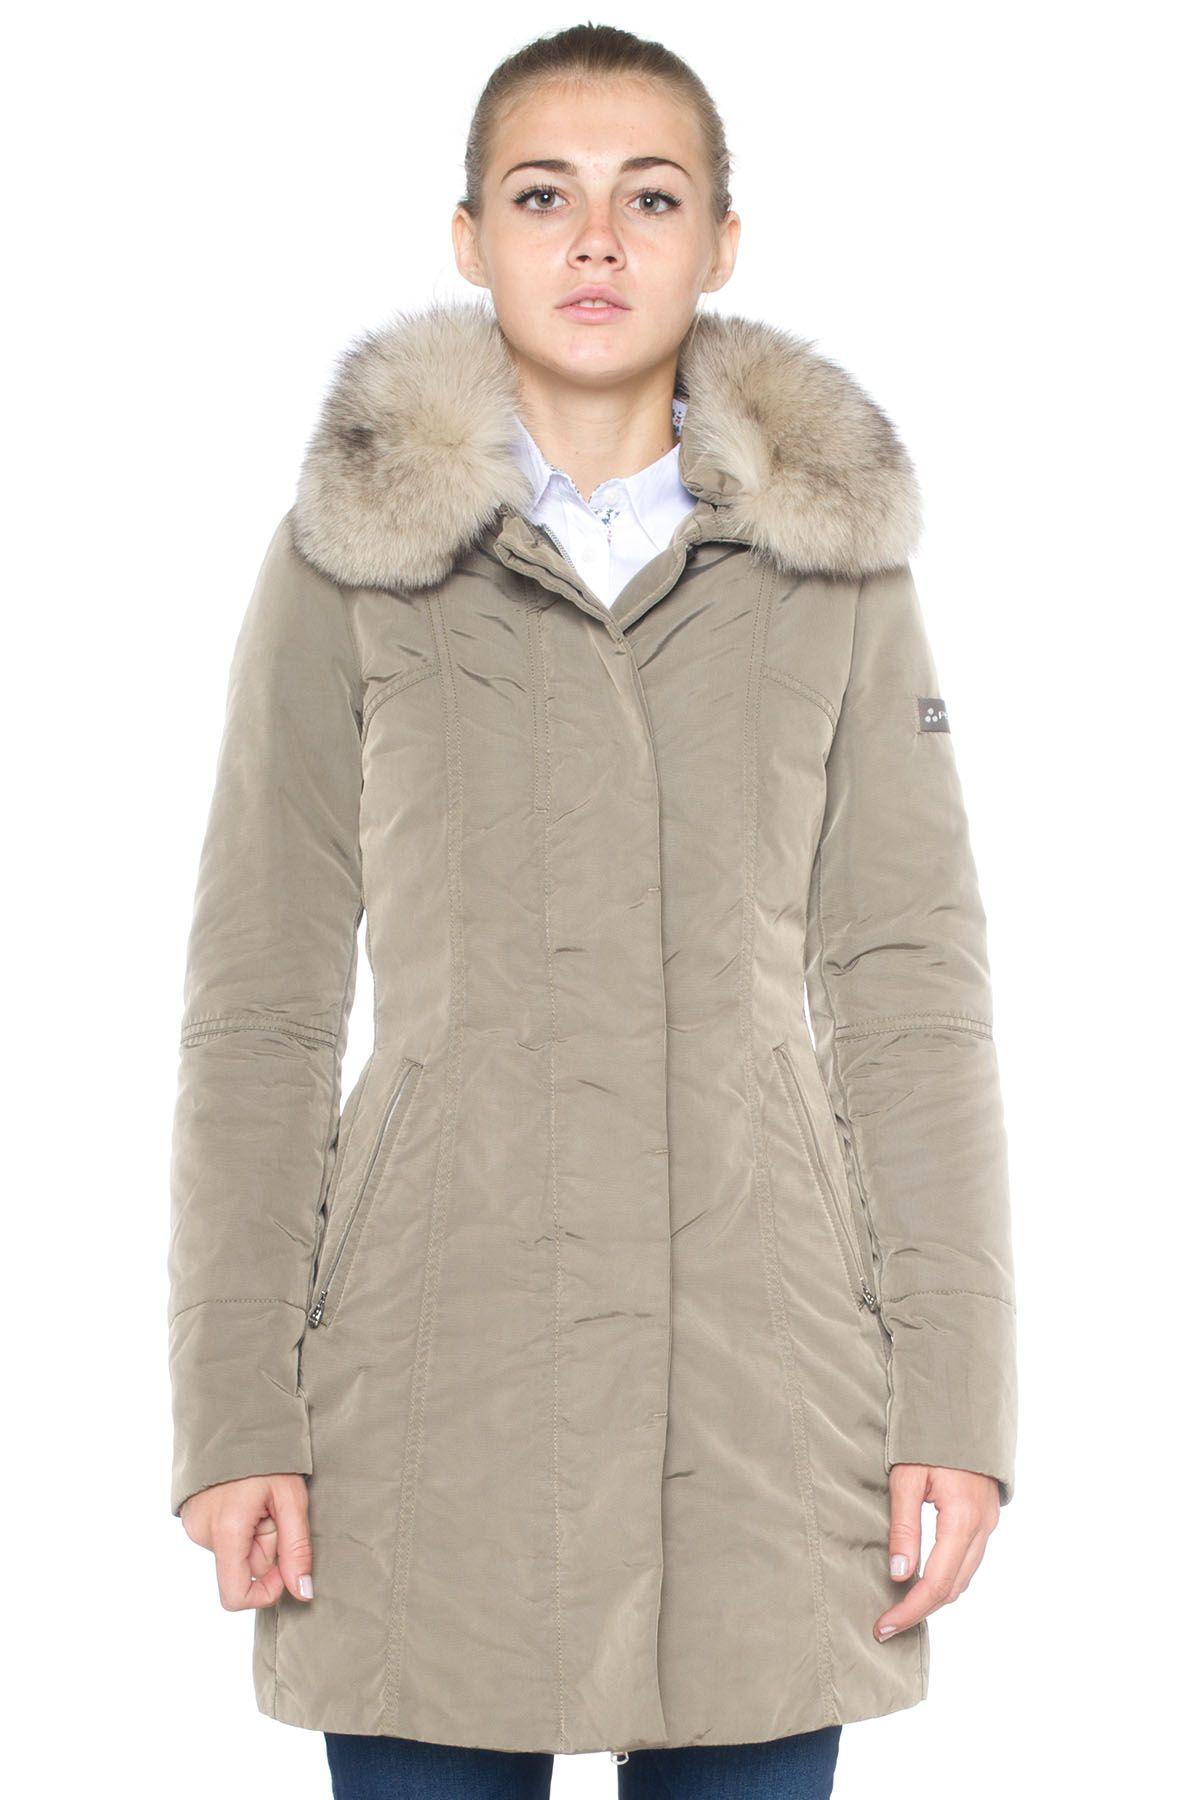 reputable site ac936 ad527 Coat Metropolitan - Euro 699 | Peuterey | Scaglione Shopping ...